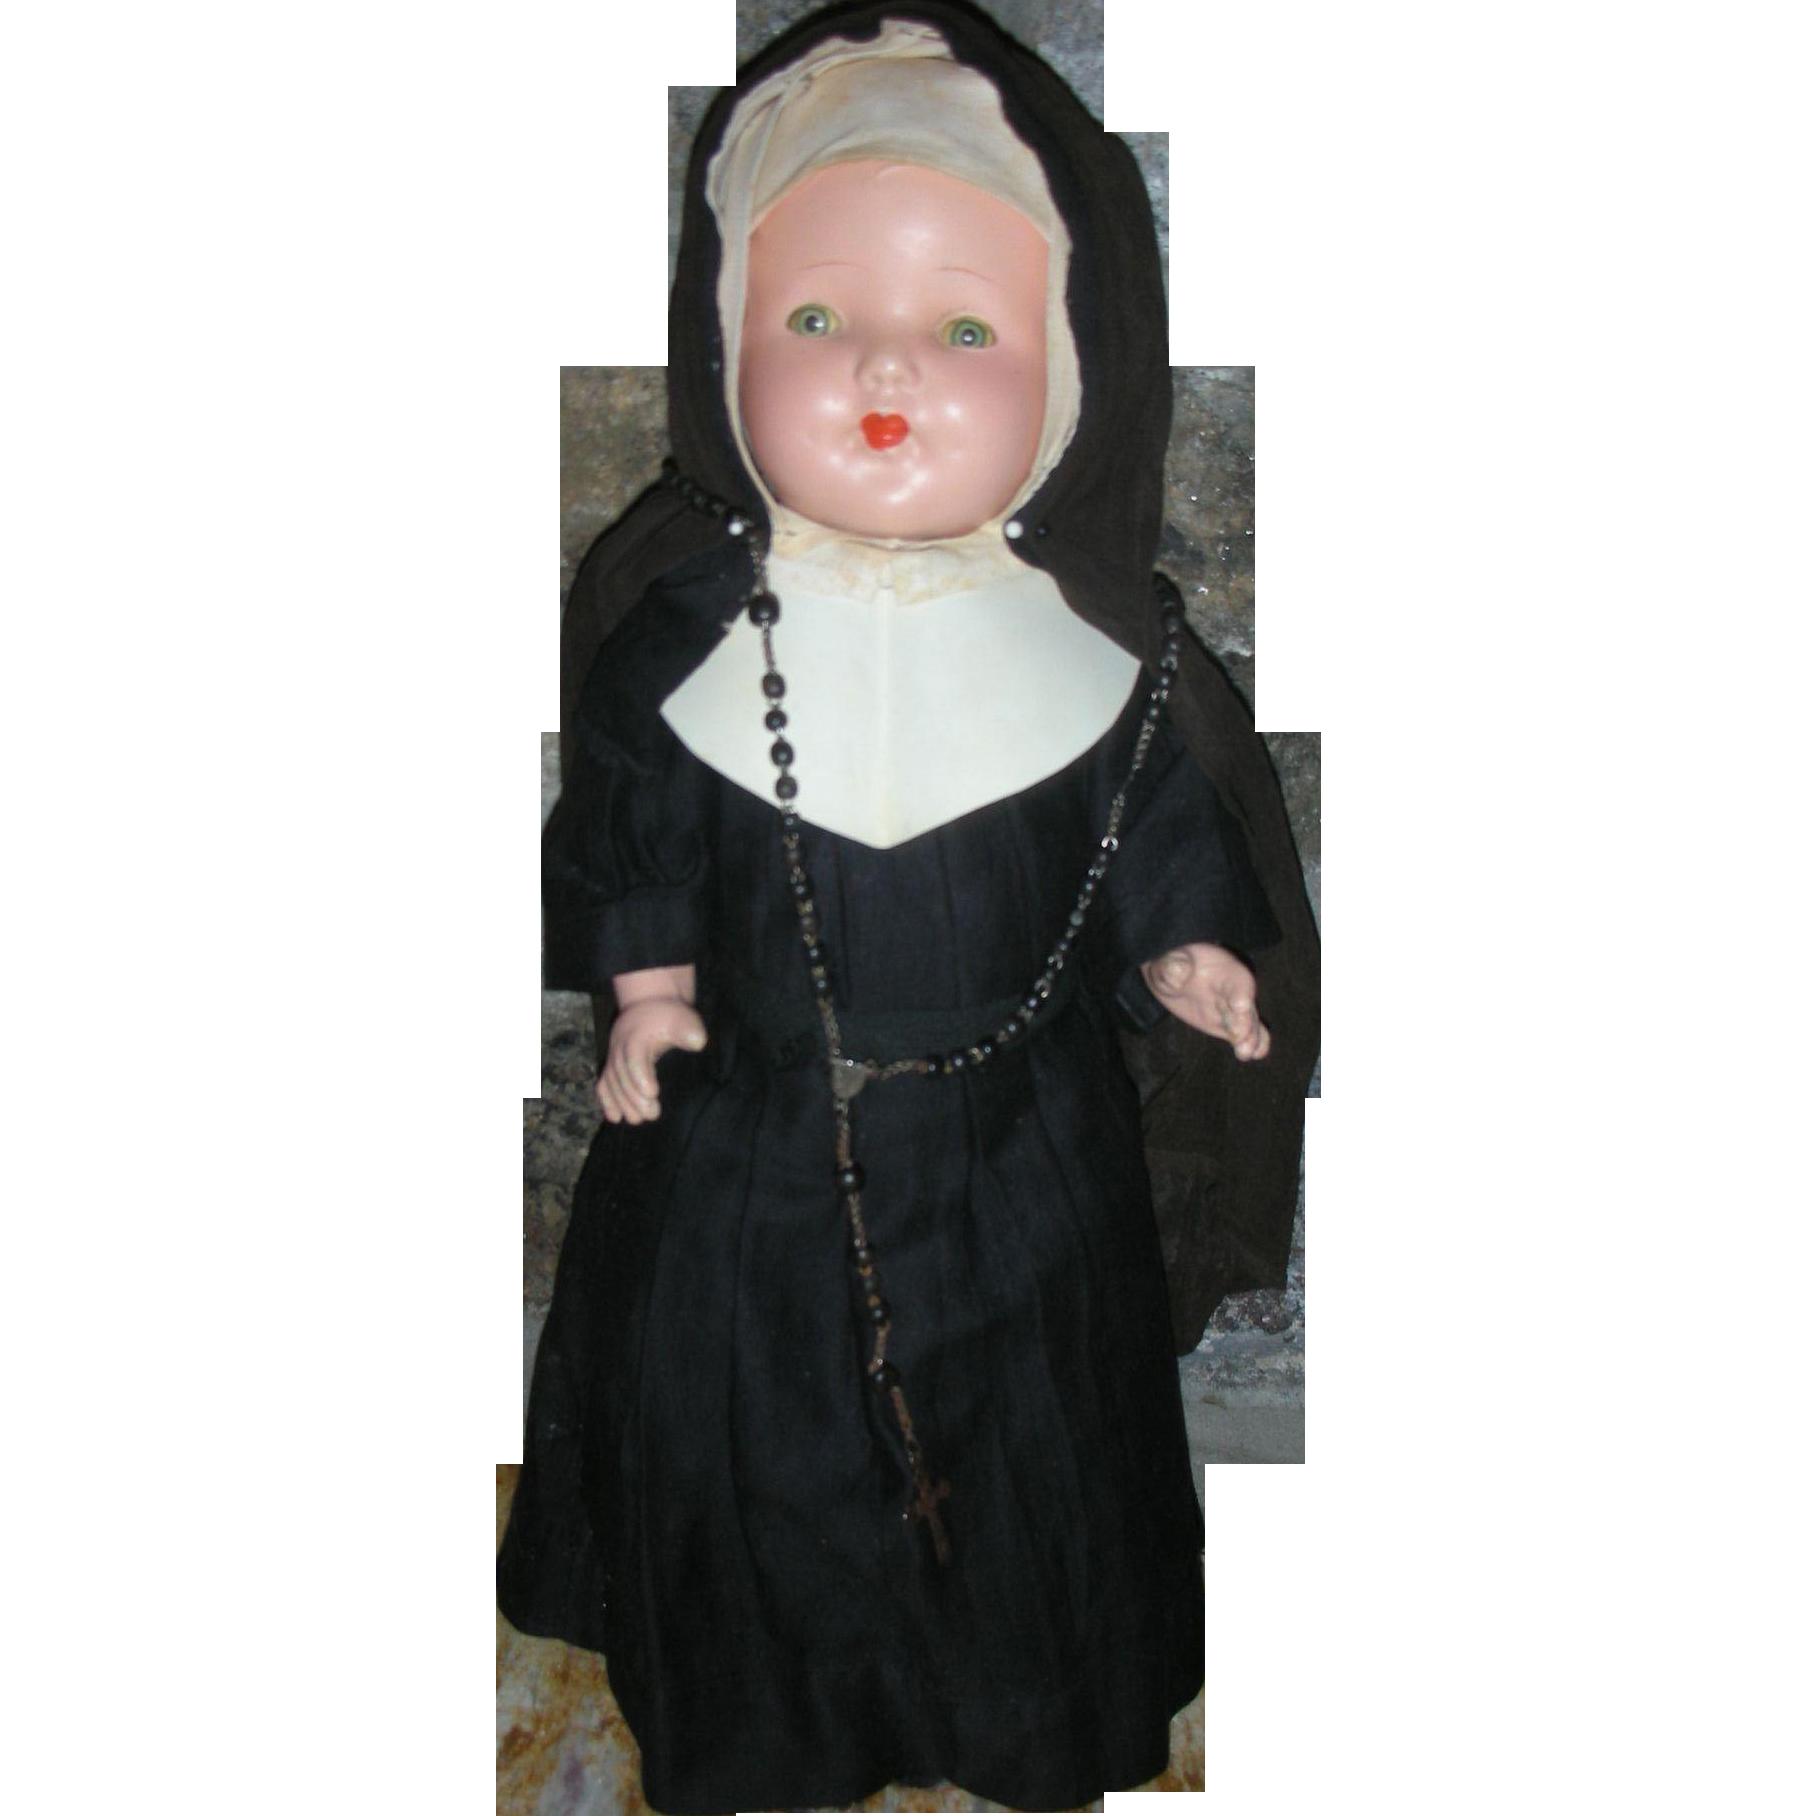 Early Vintage 17 inch All Composition Original Catholic Nun Doll Tin Sleep Eyes